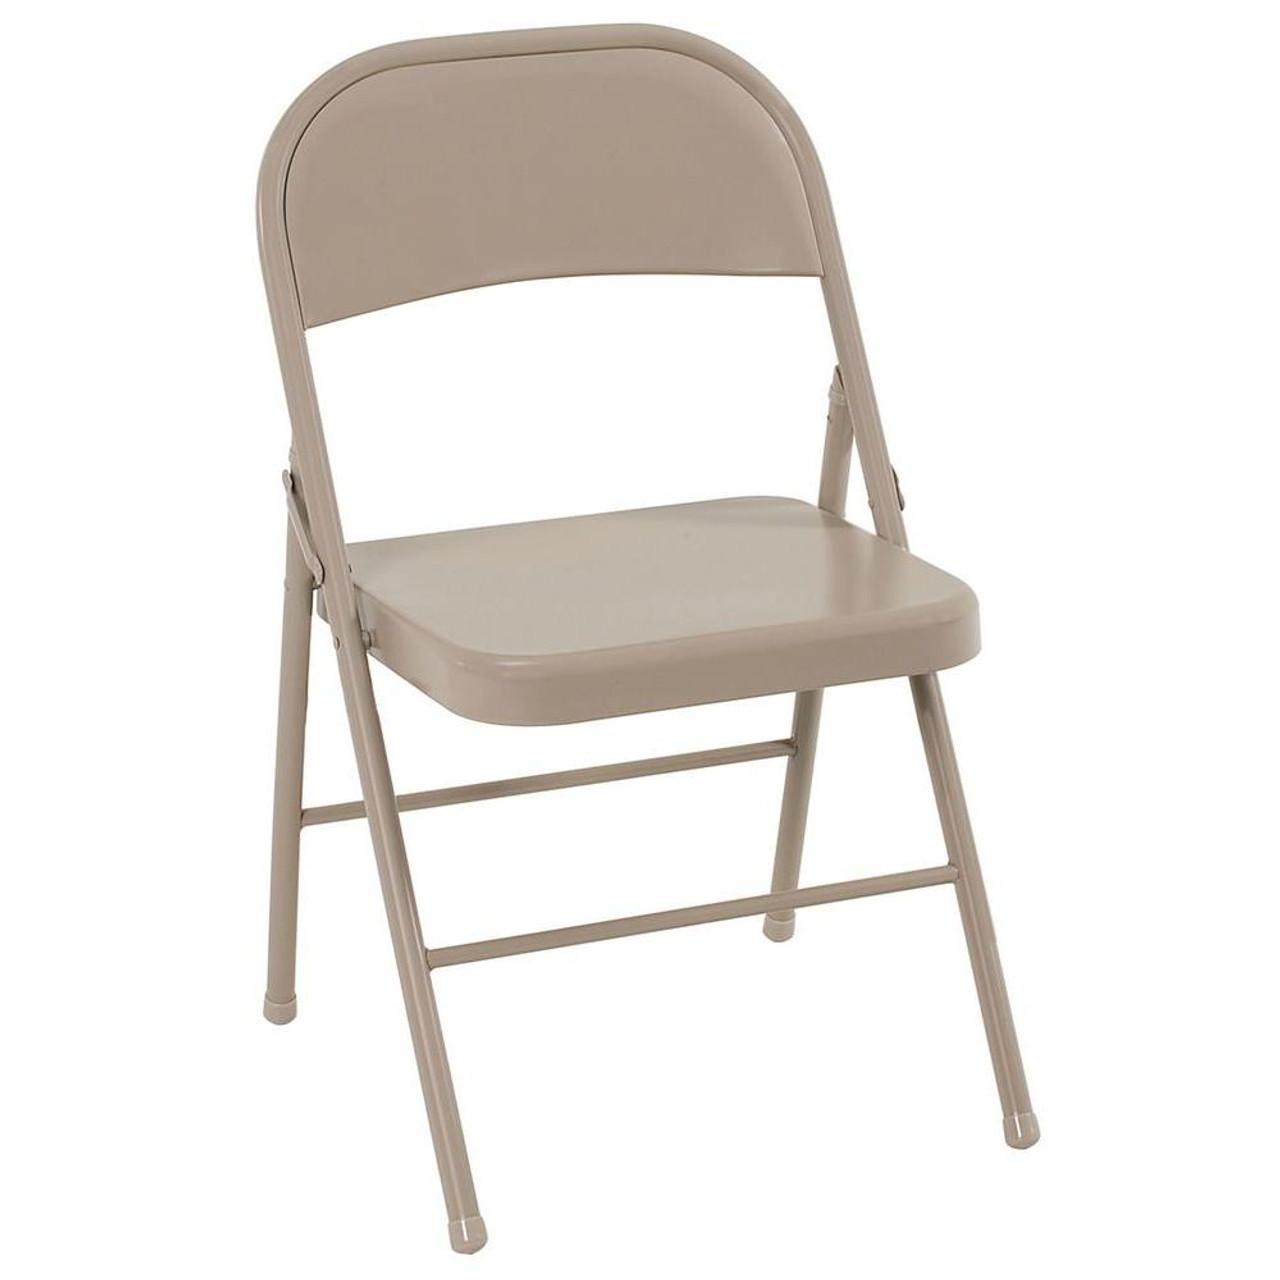 Trade Show Folding Chair Rentals